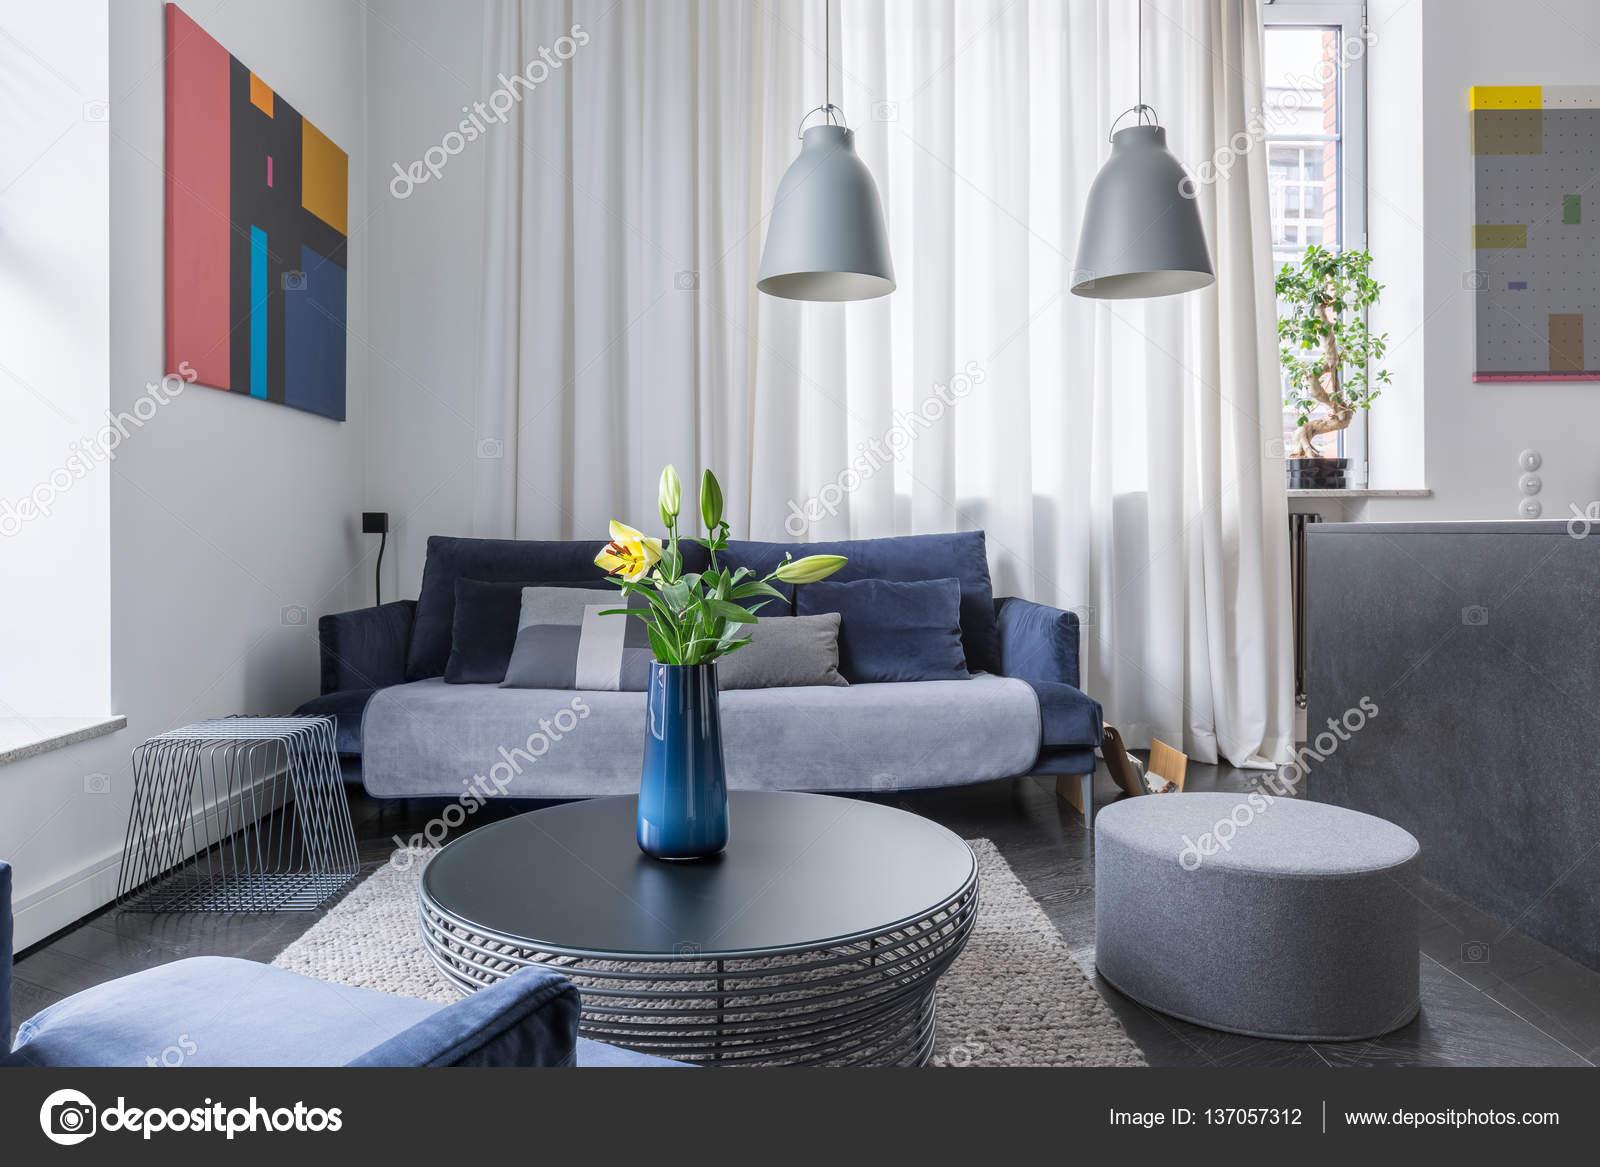 https://st3.depositphotos.com/6297298/13705/i/1600/depositphotos_137057312-stockafbeelding-woonkamer-met-donkere-meubels.jpg